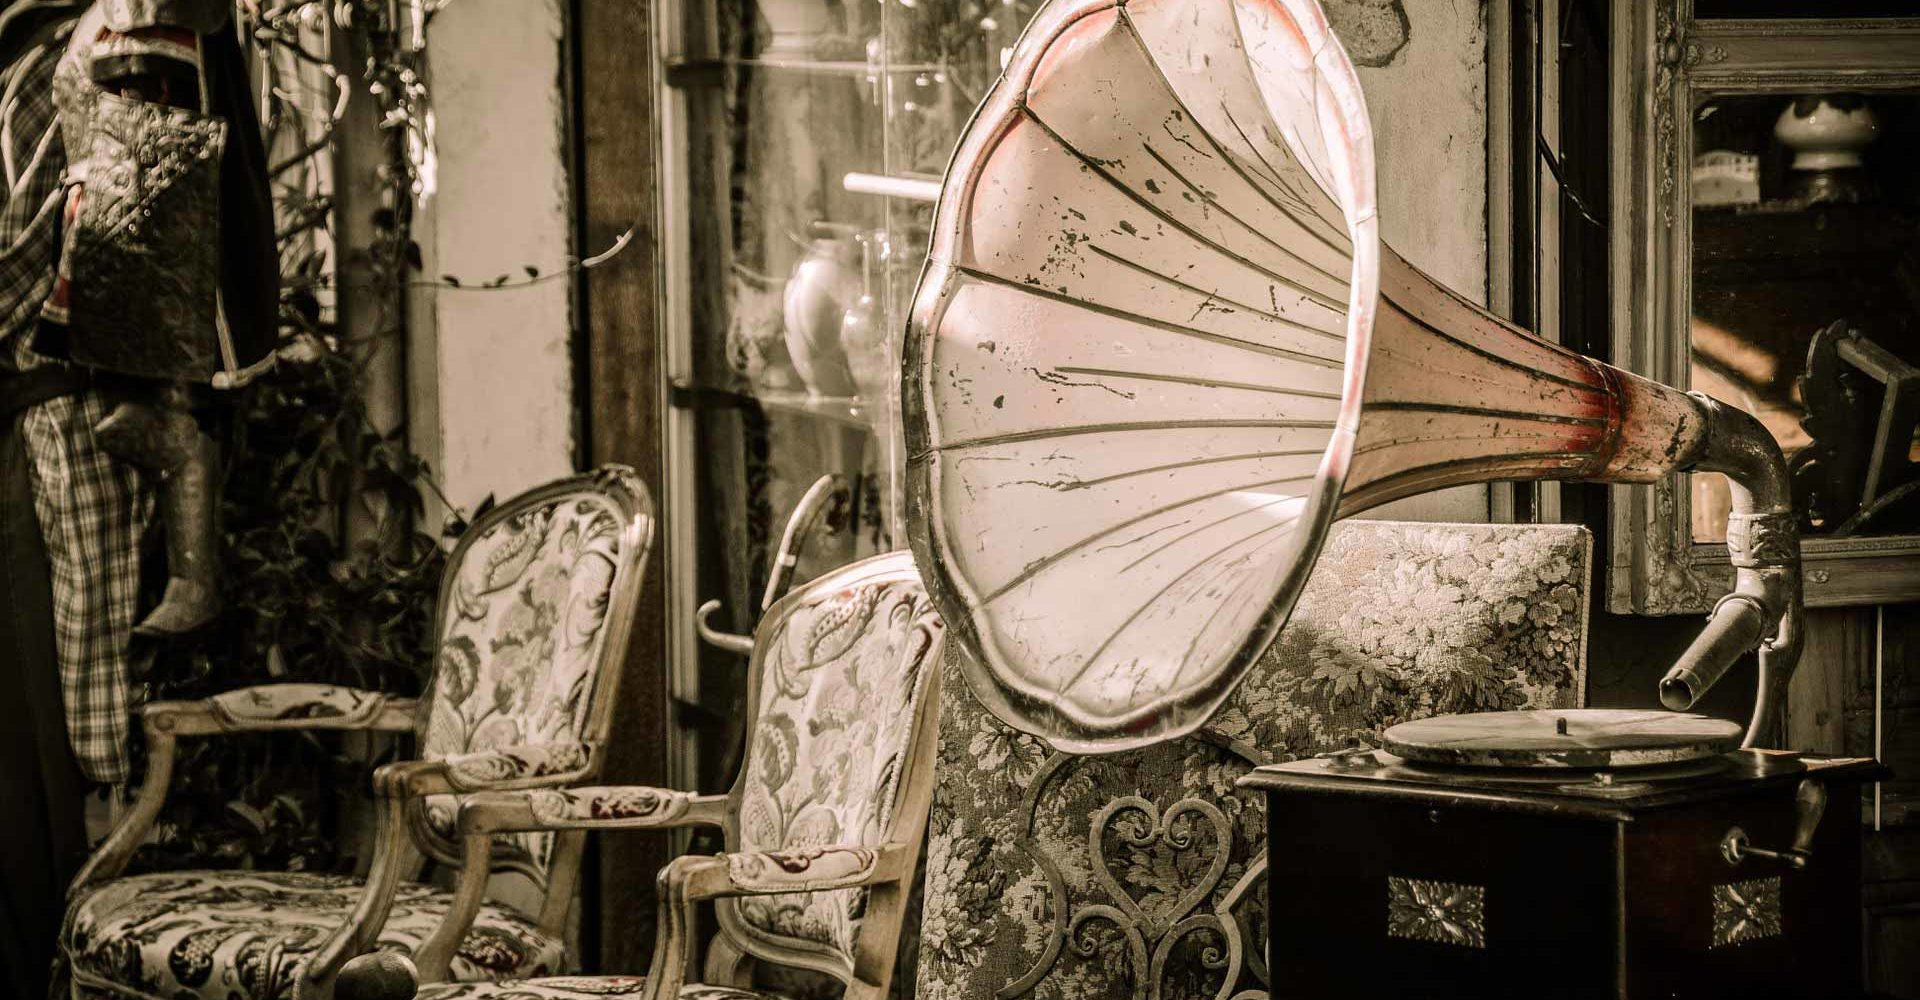 Milano tra negozi vintage e shopping alternativo for Negozi arredamento vintage milano